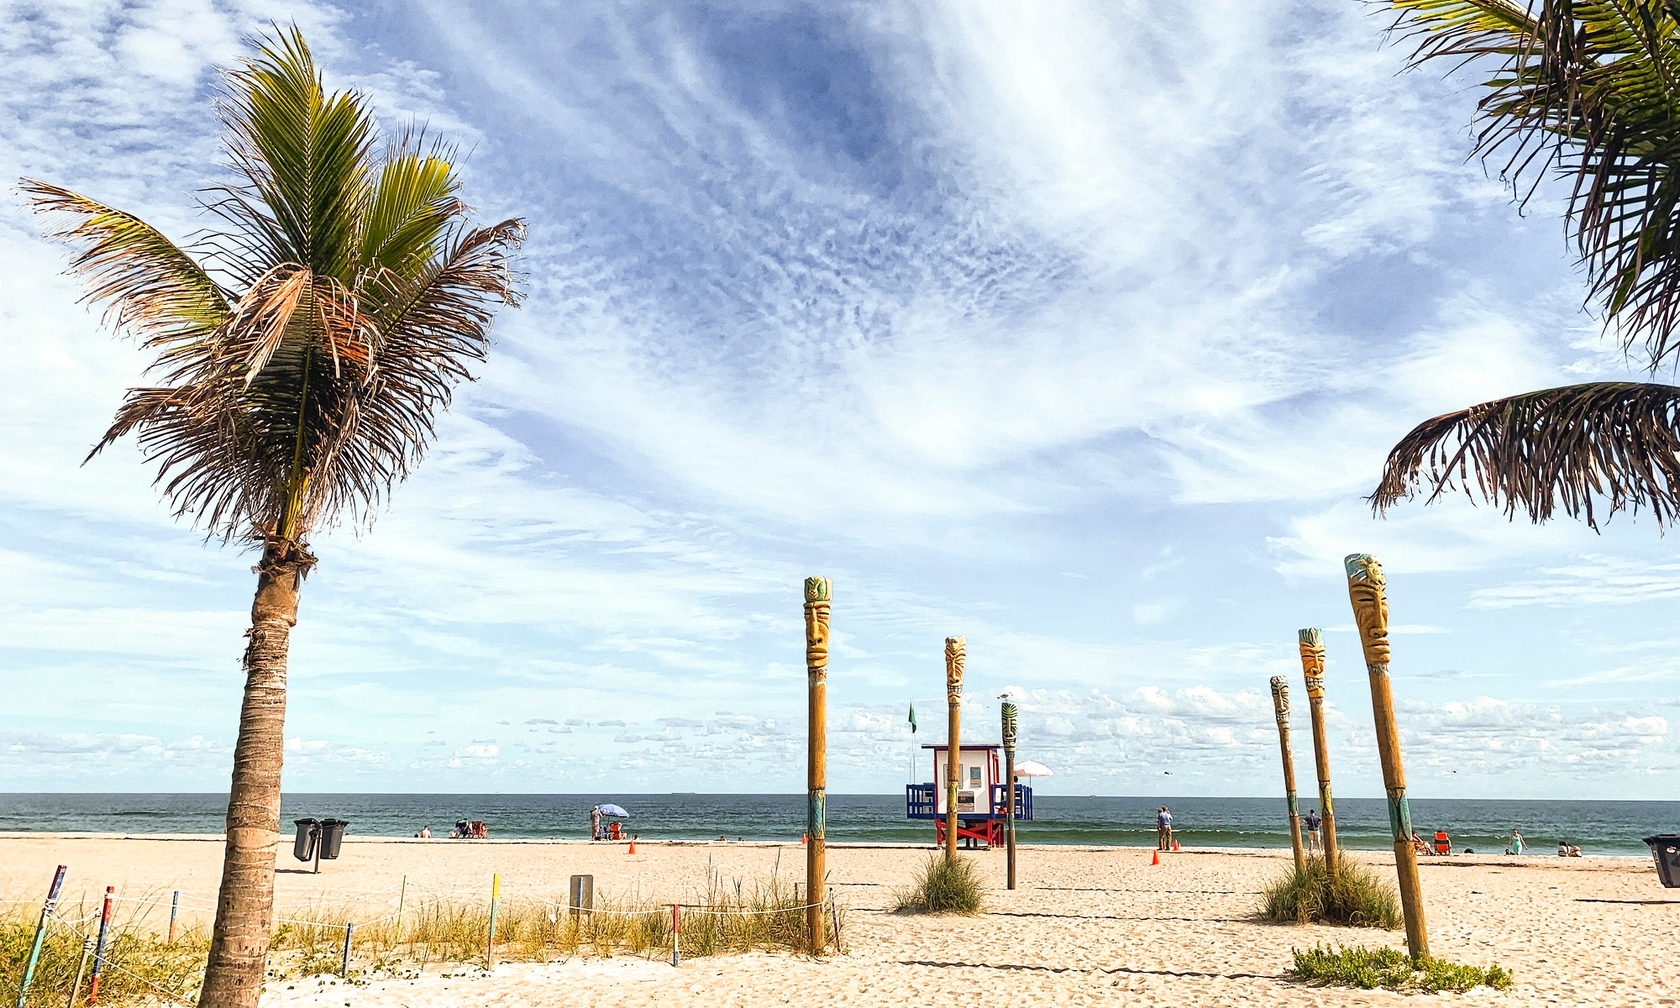 Vacation rentals in Cocoa Beach